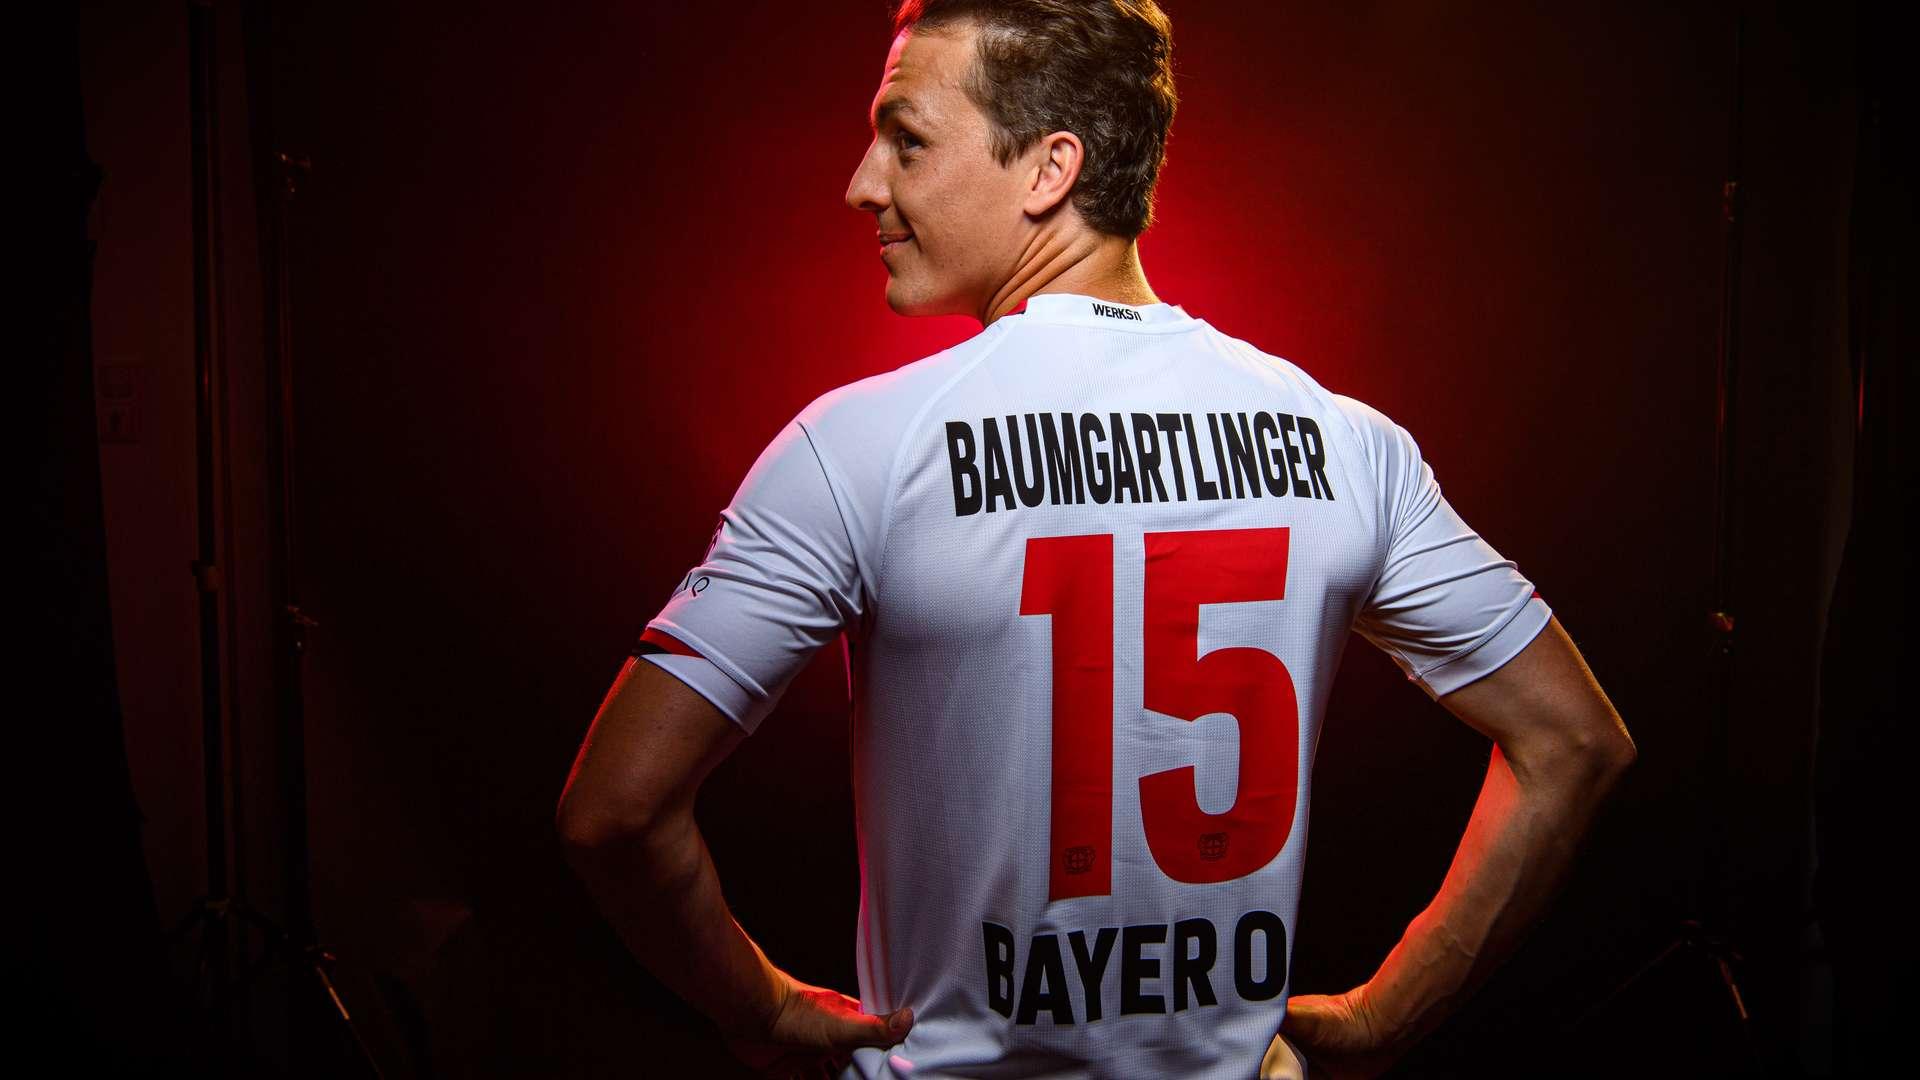 Bayer 04 Leverkusen 2021-22 Jako Away Kit | 21/22 Kits | Football ...